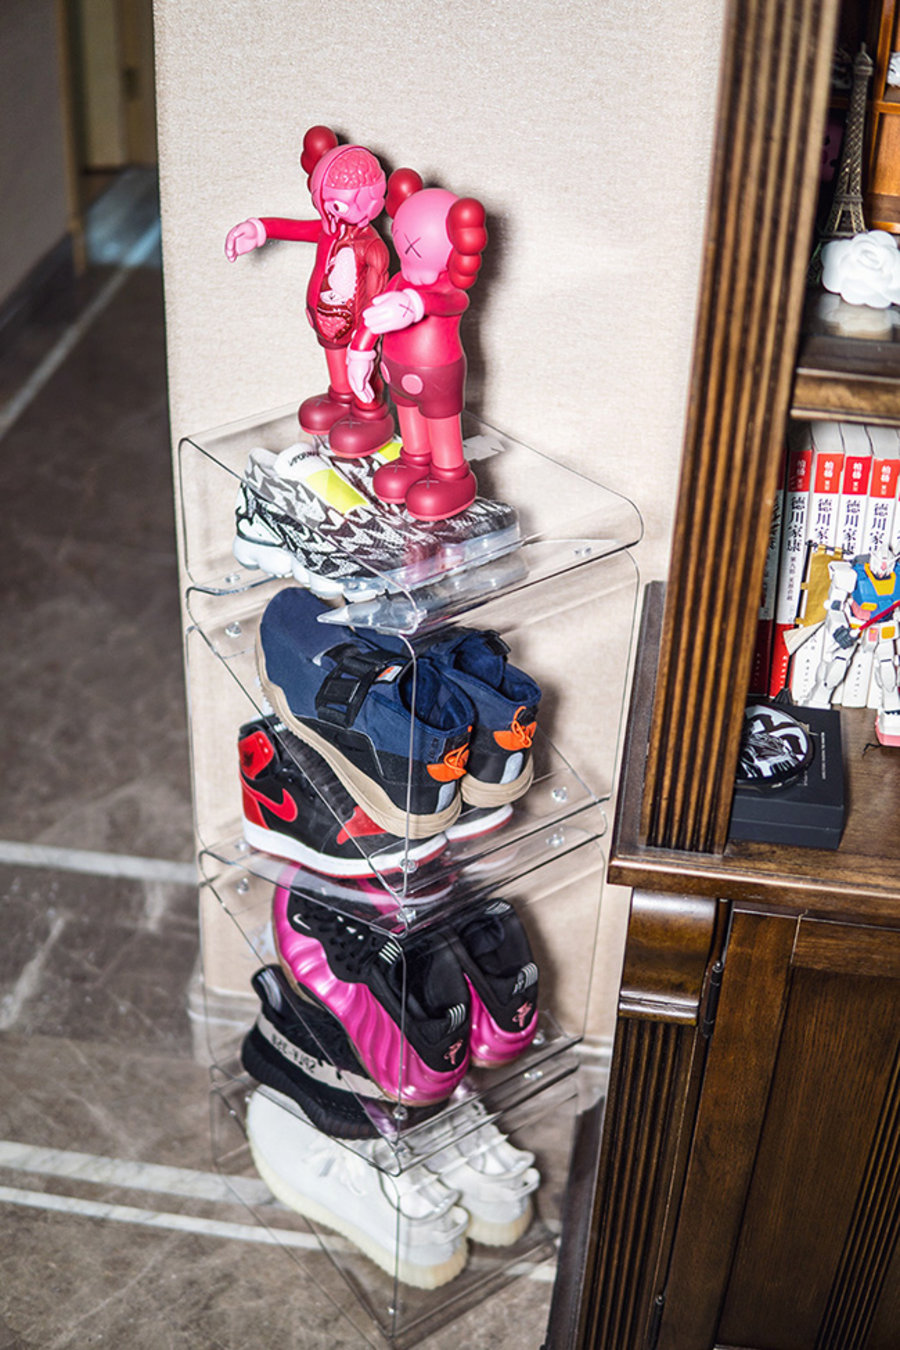 SoleNest,鞋盒  让你的球鞋变成朋友圈的「点赞明星」,只需要这一招!